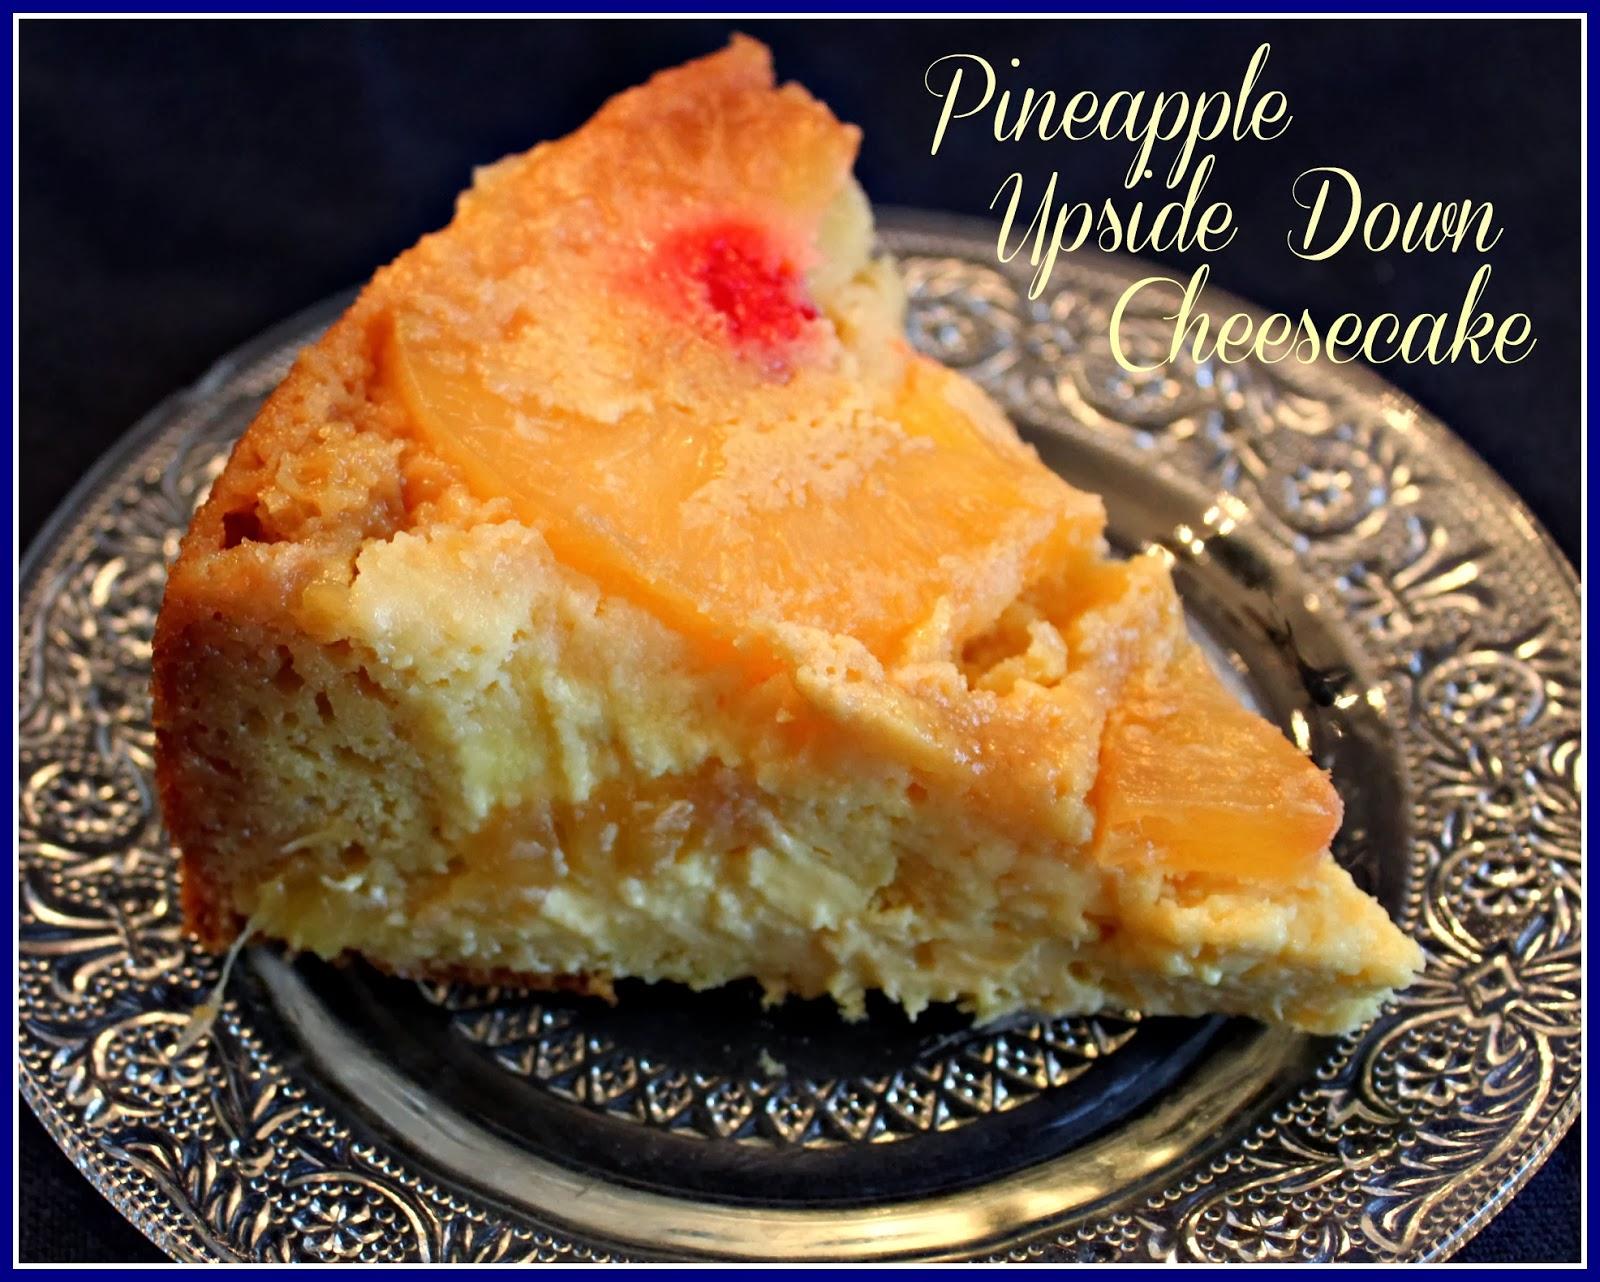 Sweet Tea And Cornbread Pineapple Upside Down Cheesecake